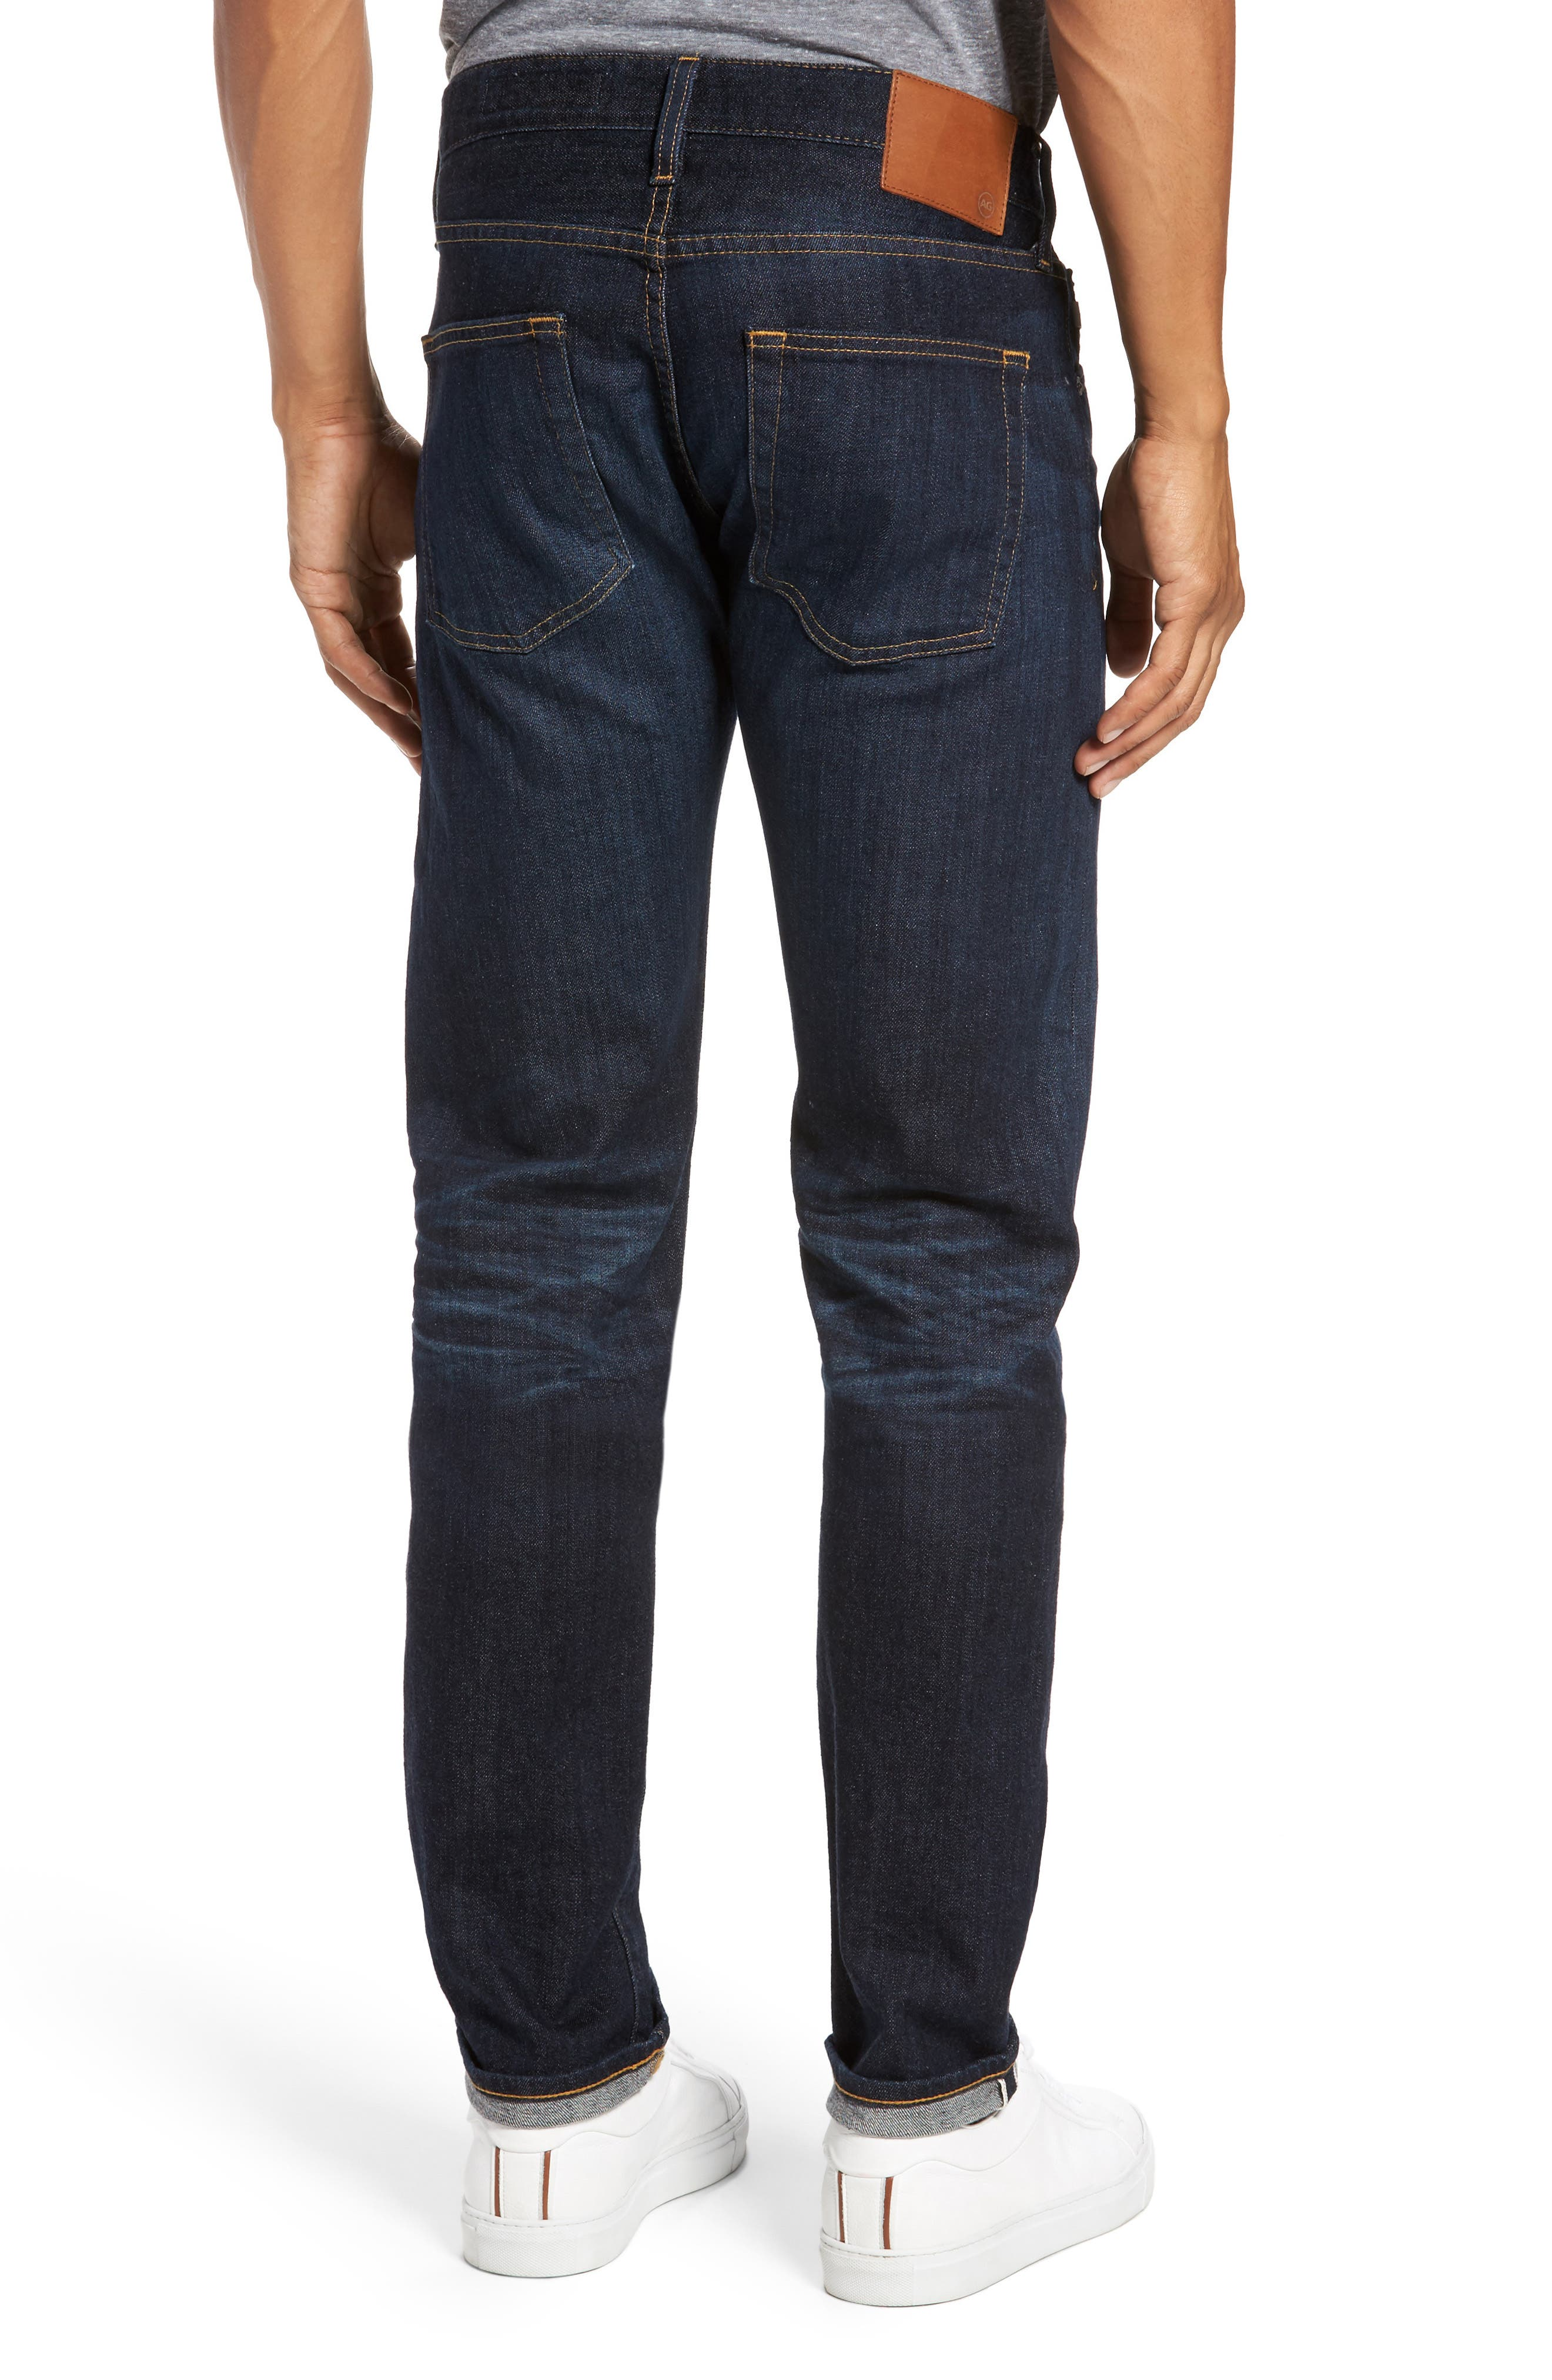 Tellis Slim Fit Jeans,                             Alternate thumbnail 2, color,                             2 Years Jinx